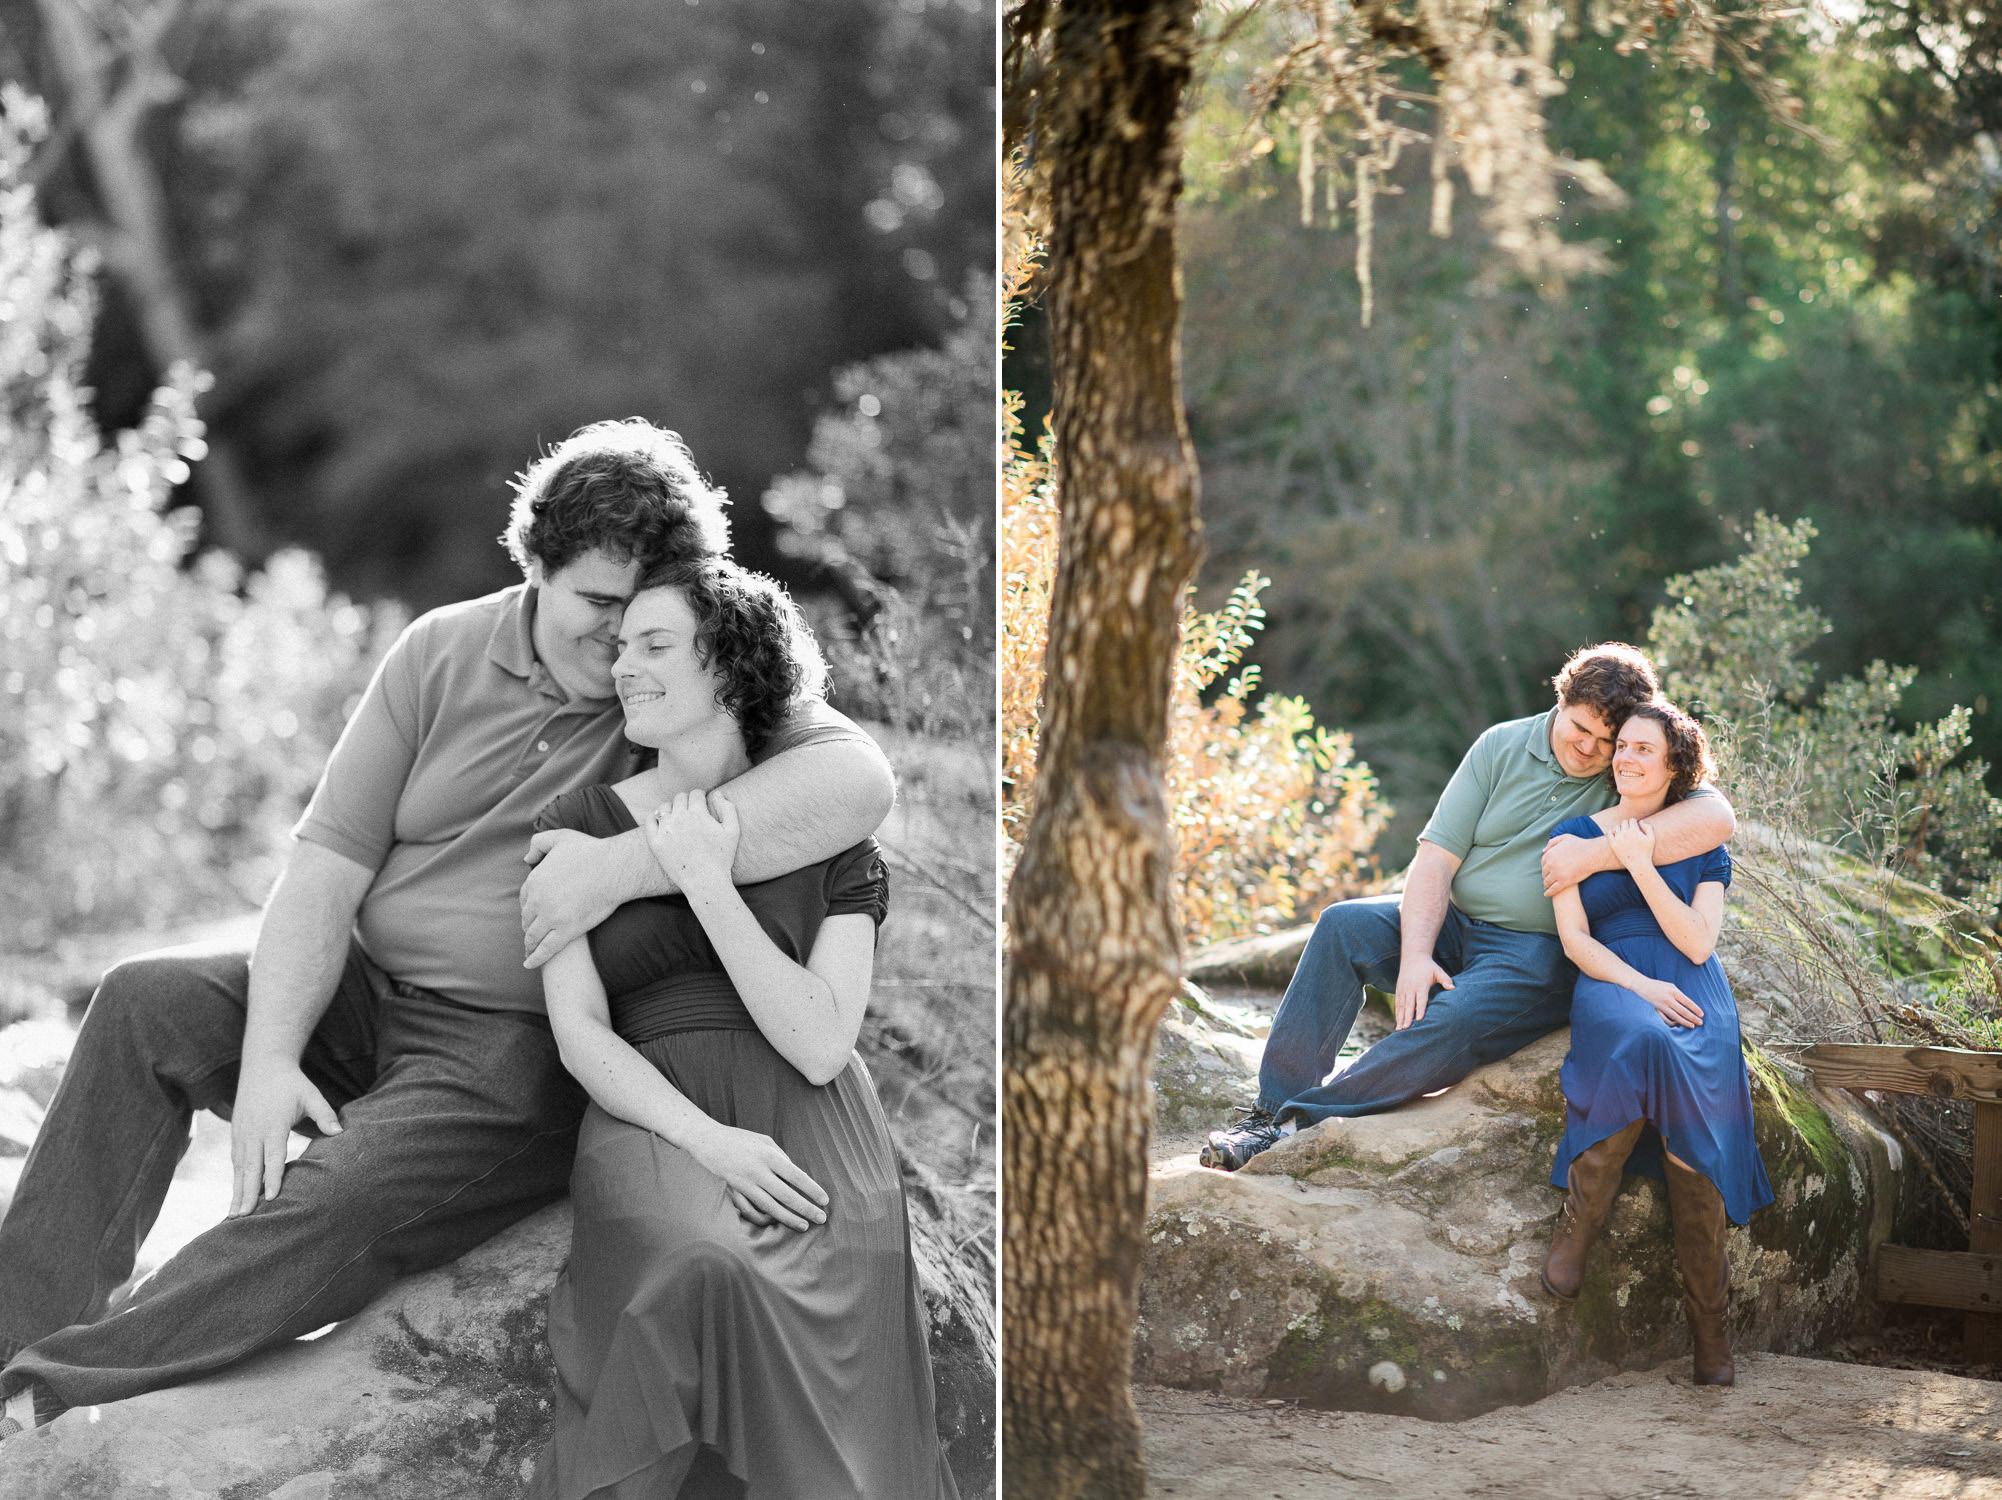 Chitactac Adams and Anderson Lake County Park Engagement 001.jpg